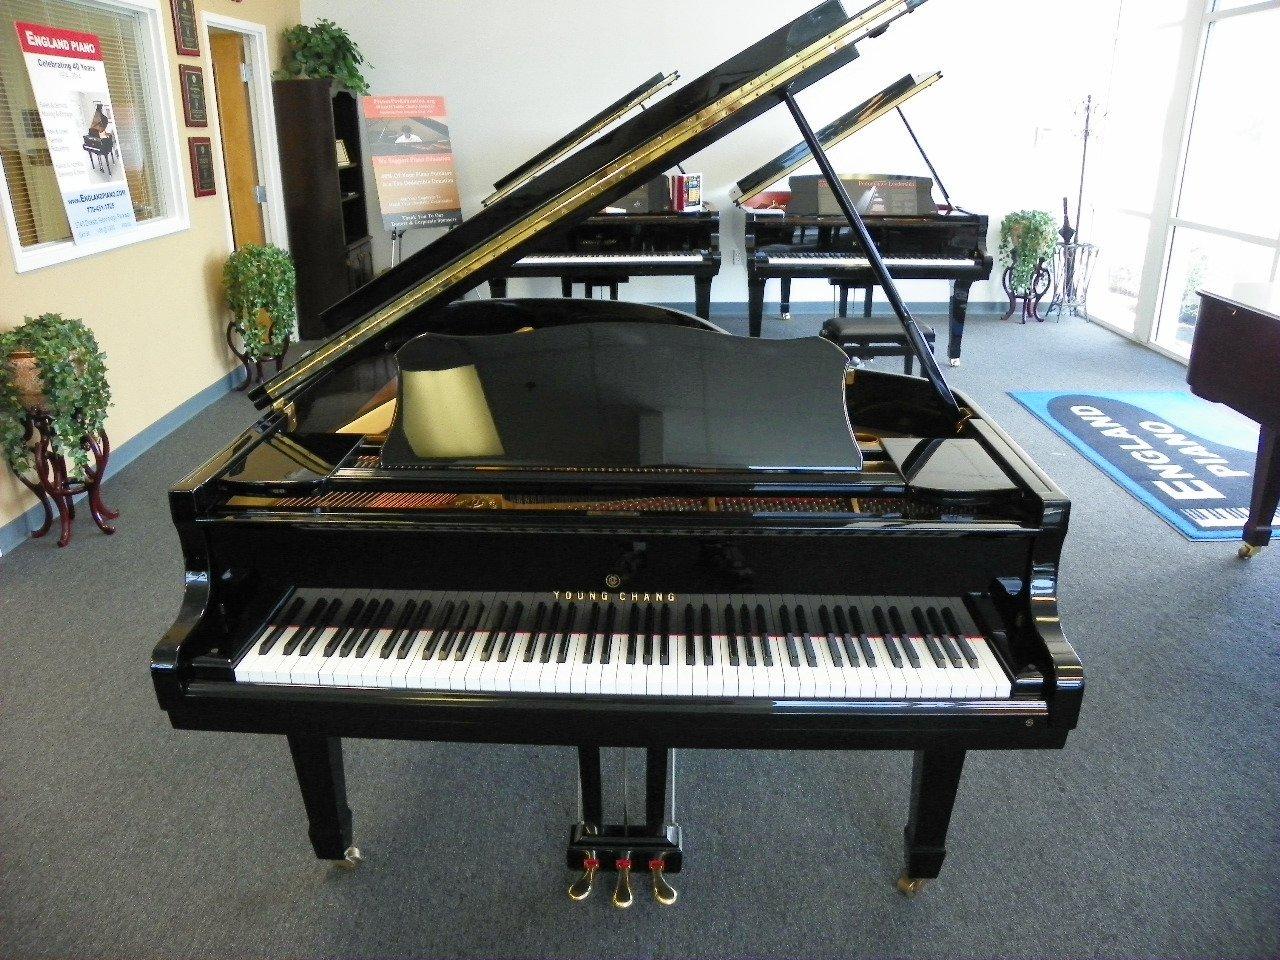 Young Chang Piano   England Piano